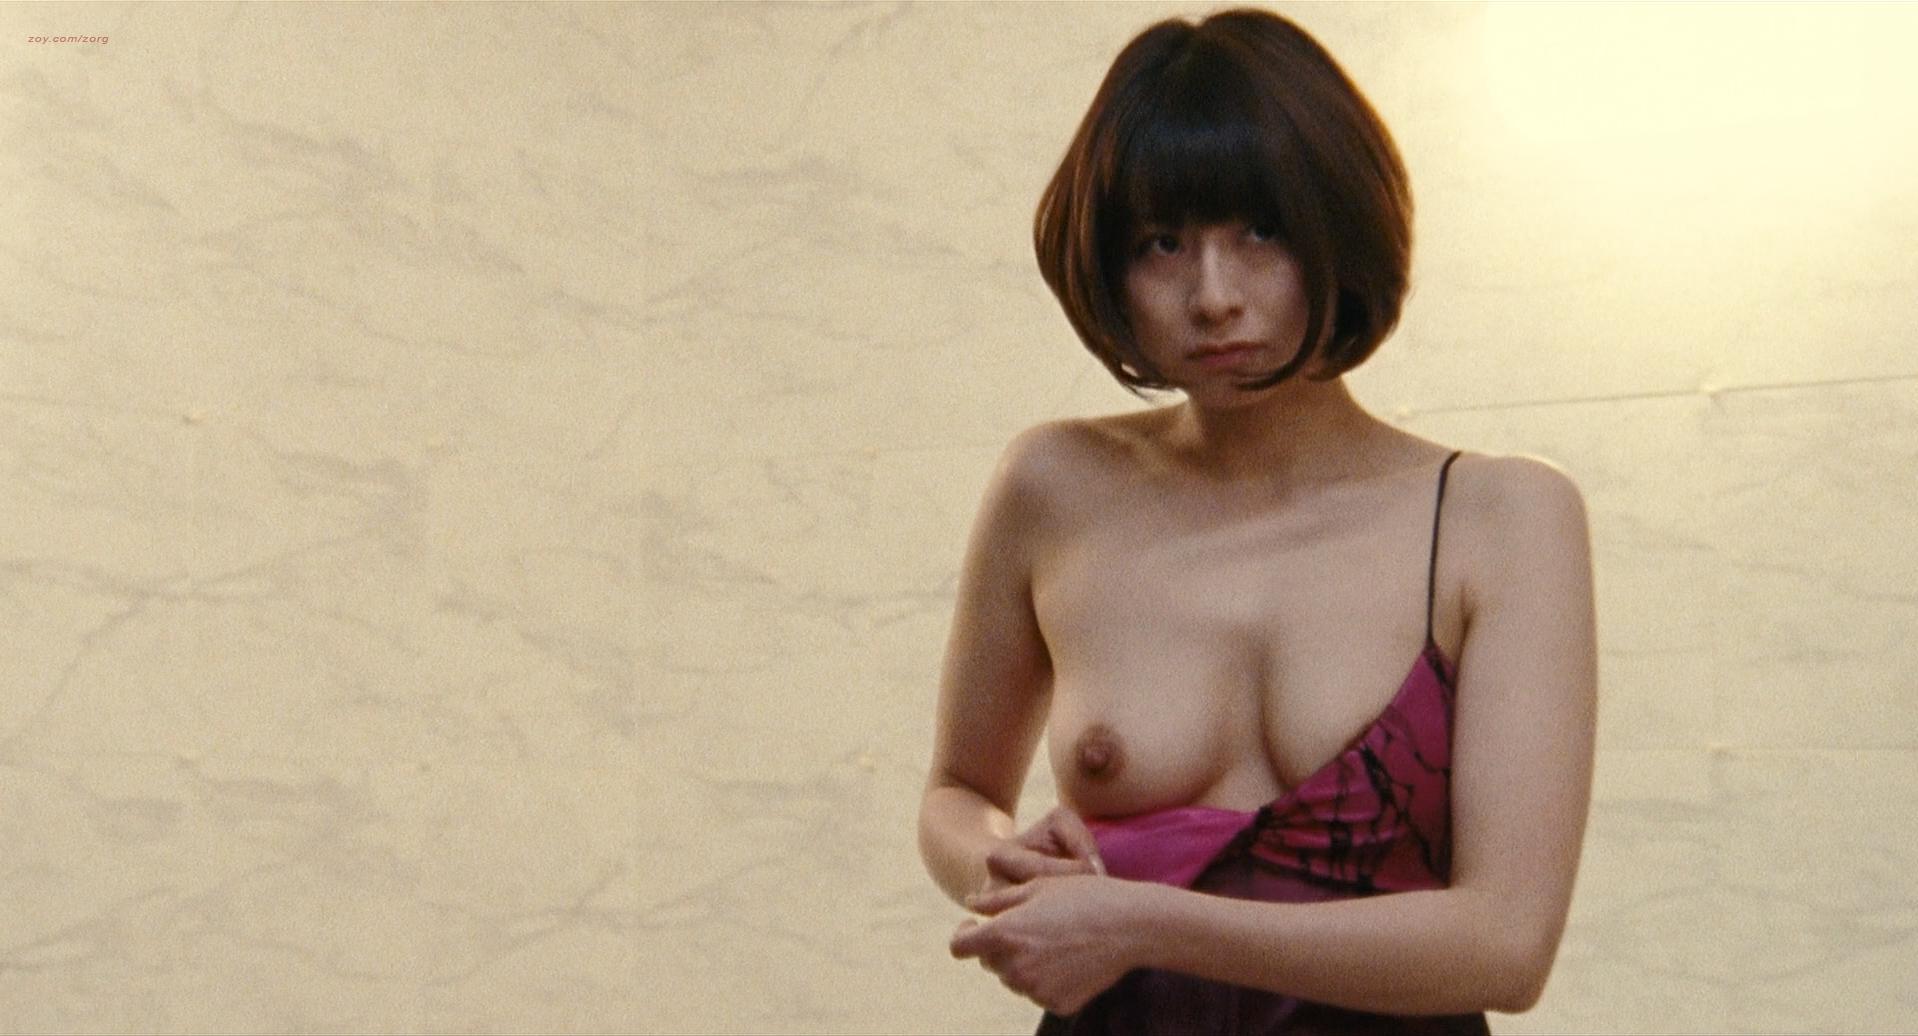 Uschi digard tara strohmeier nude the kentucky fried movie - 17 part 4